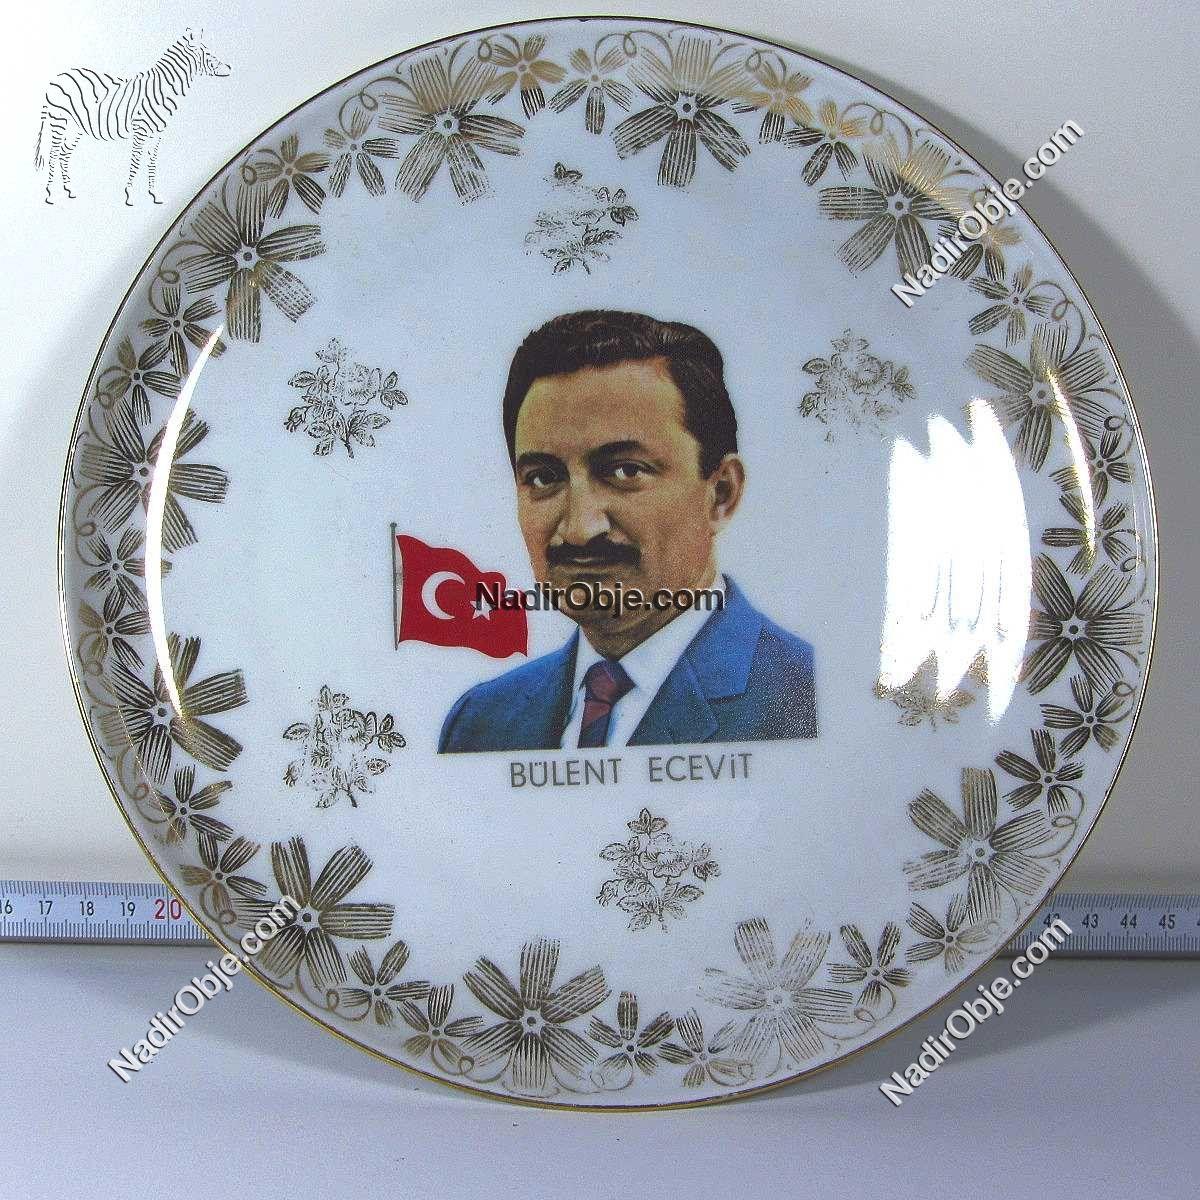 Bülent Ecevit Porselen Tabak Seçtiklerimiz Bülent Ecevit